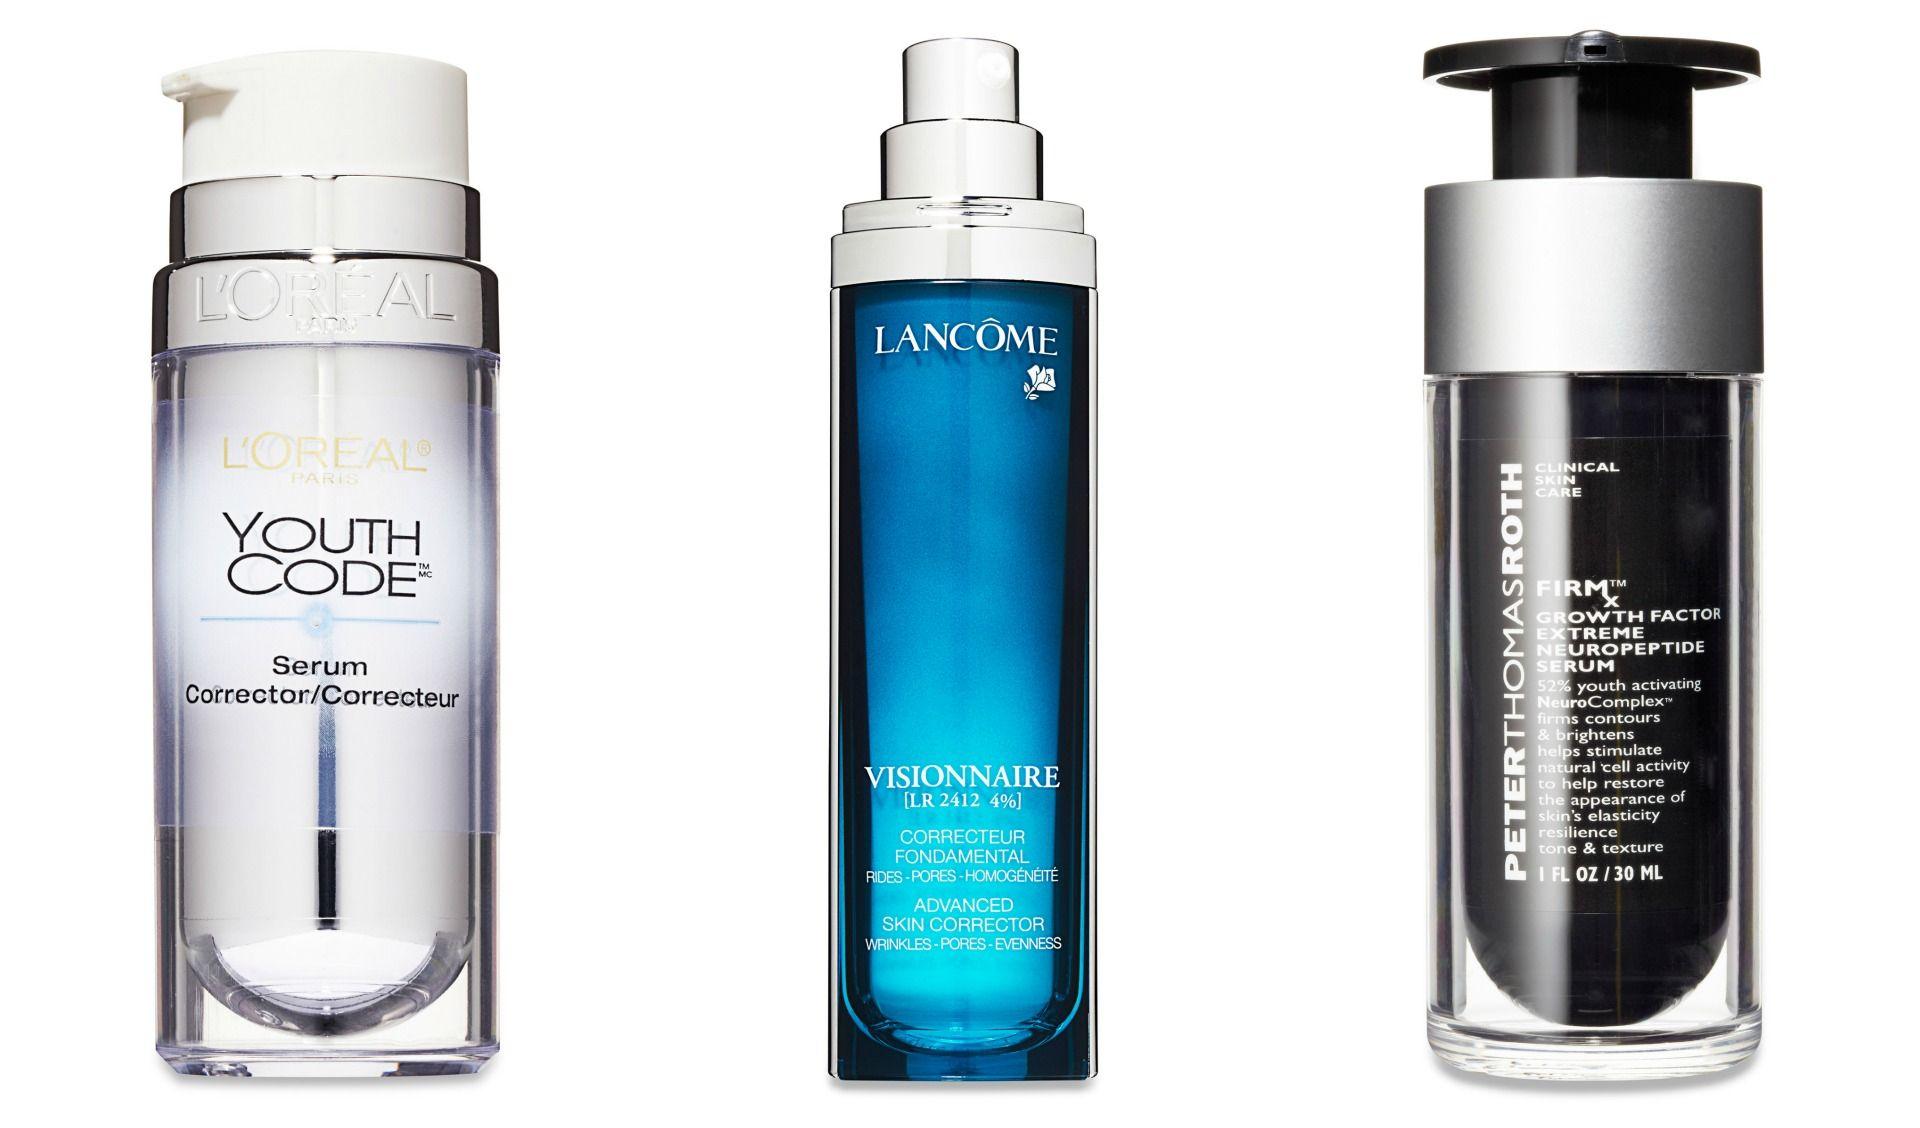 2014 Beauty Awards Best Of Skincare Skin Care Beauty Awards Liquid Beauty